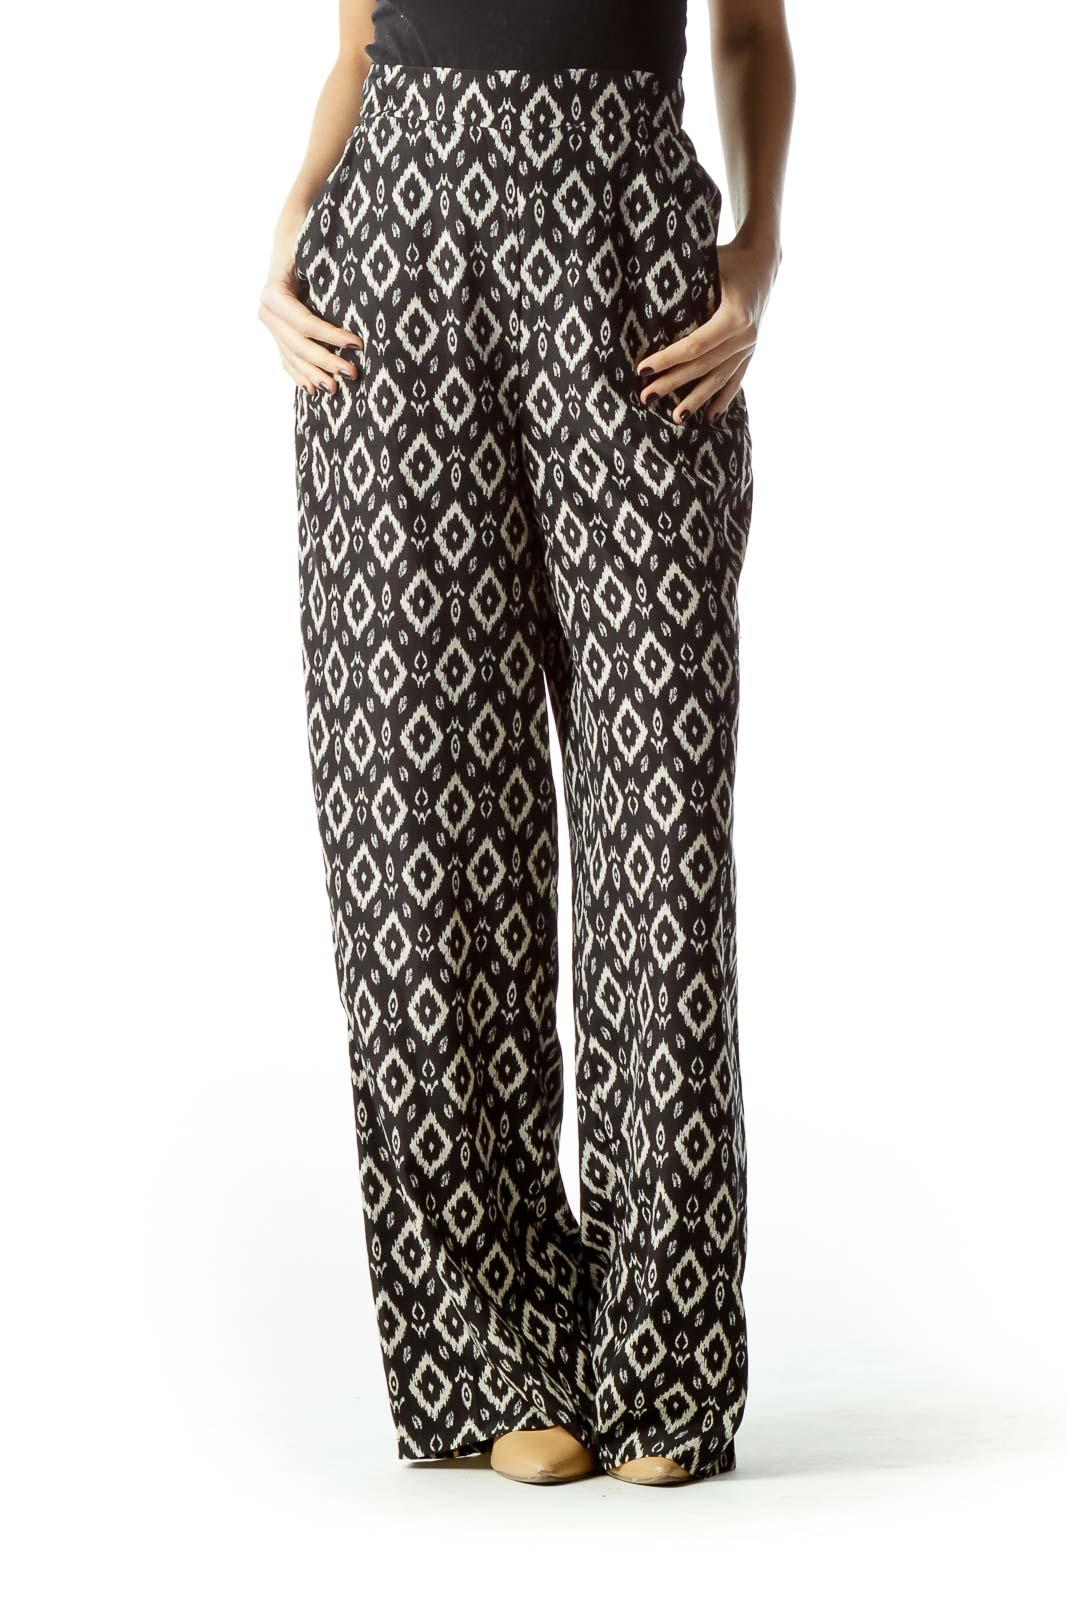 Black Beige Geometric Print Pants Front